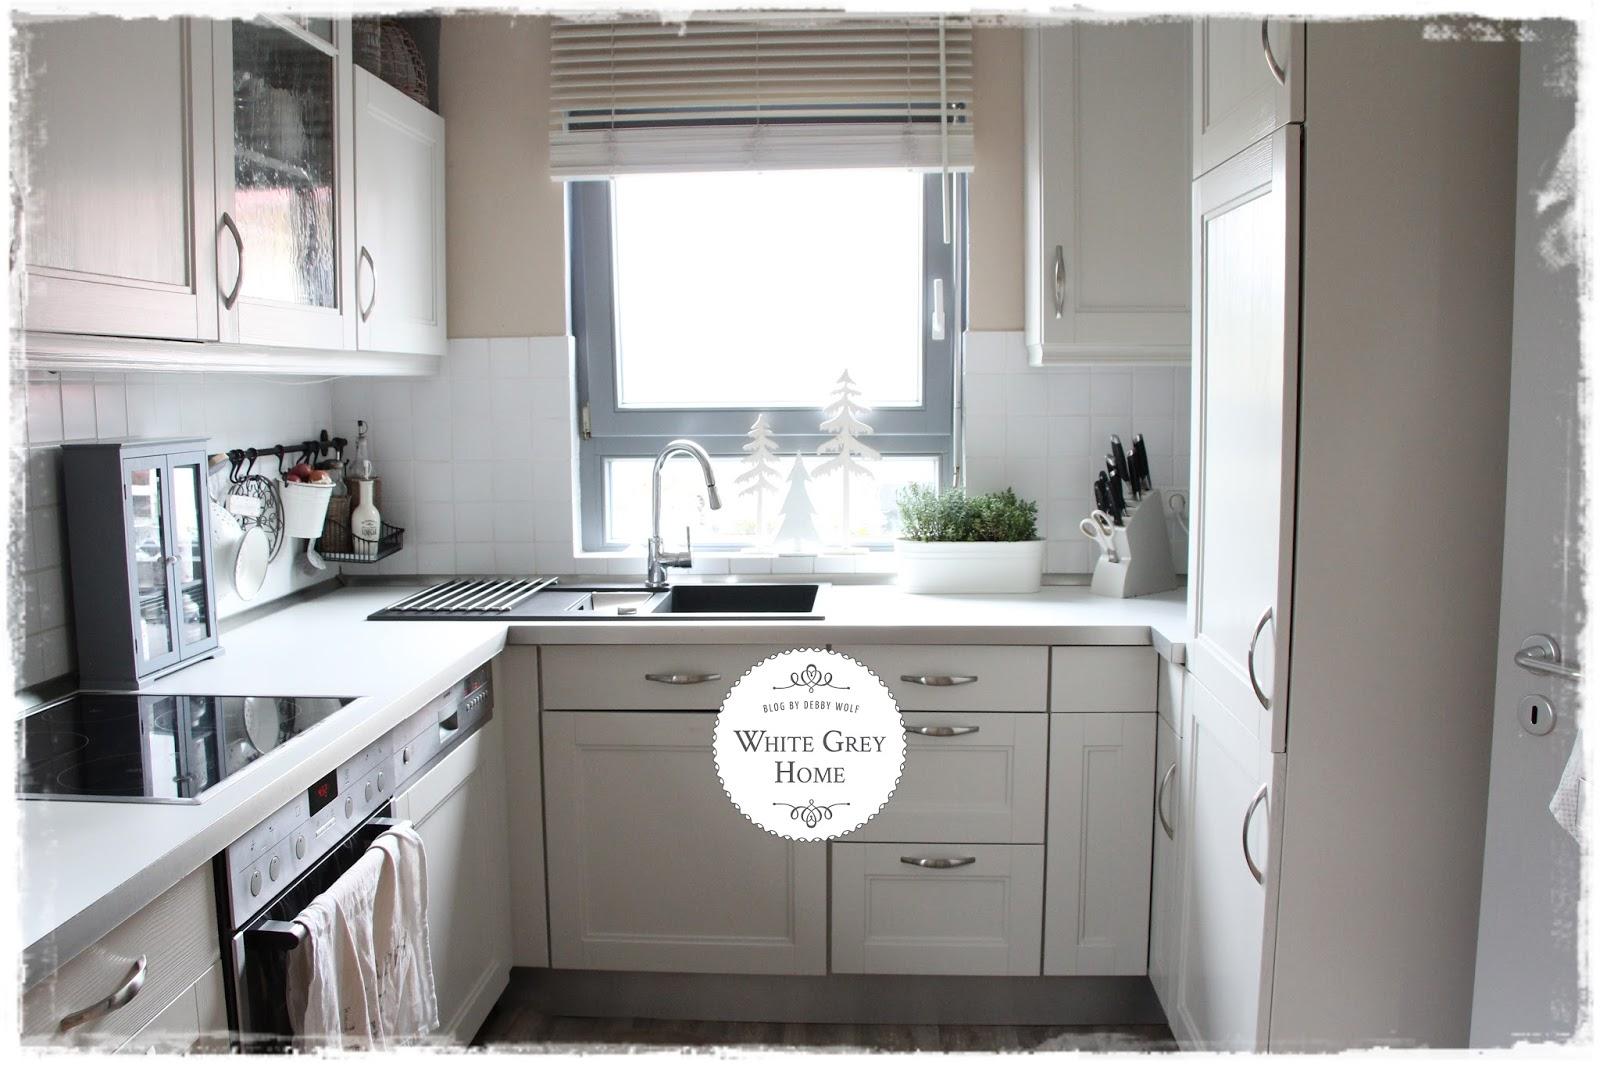 white grey home kitchen news. Black Bedroom Furniture Sets. Home Design Ideas